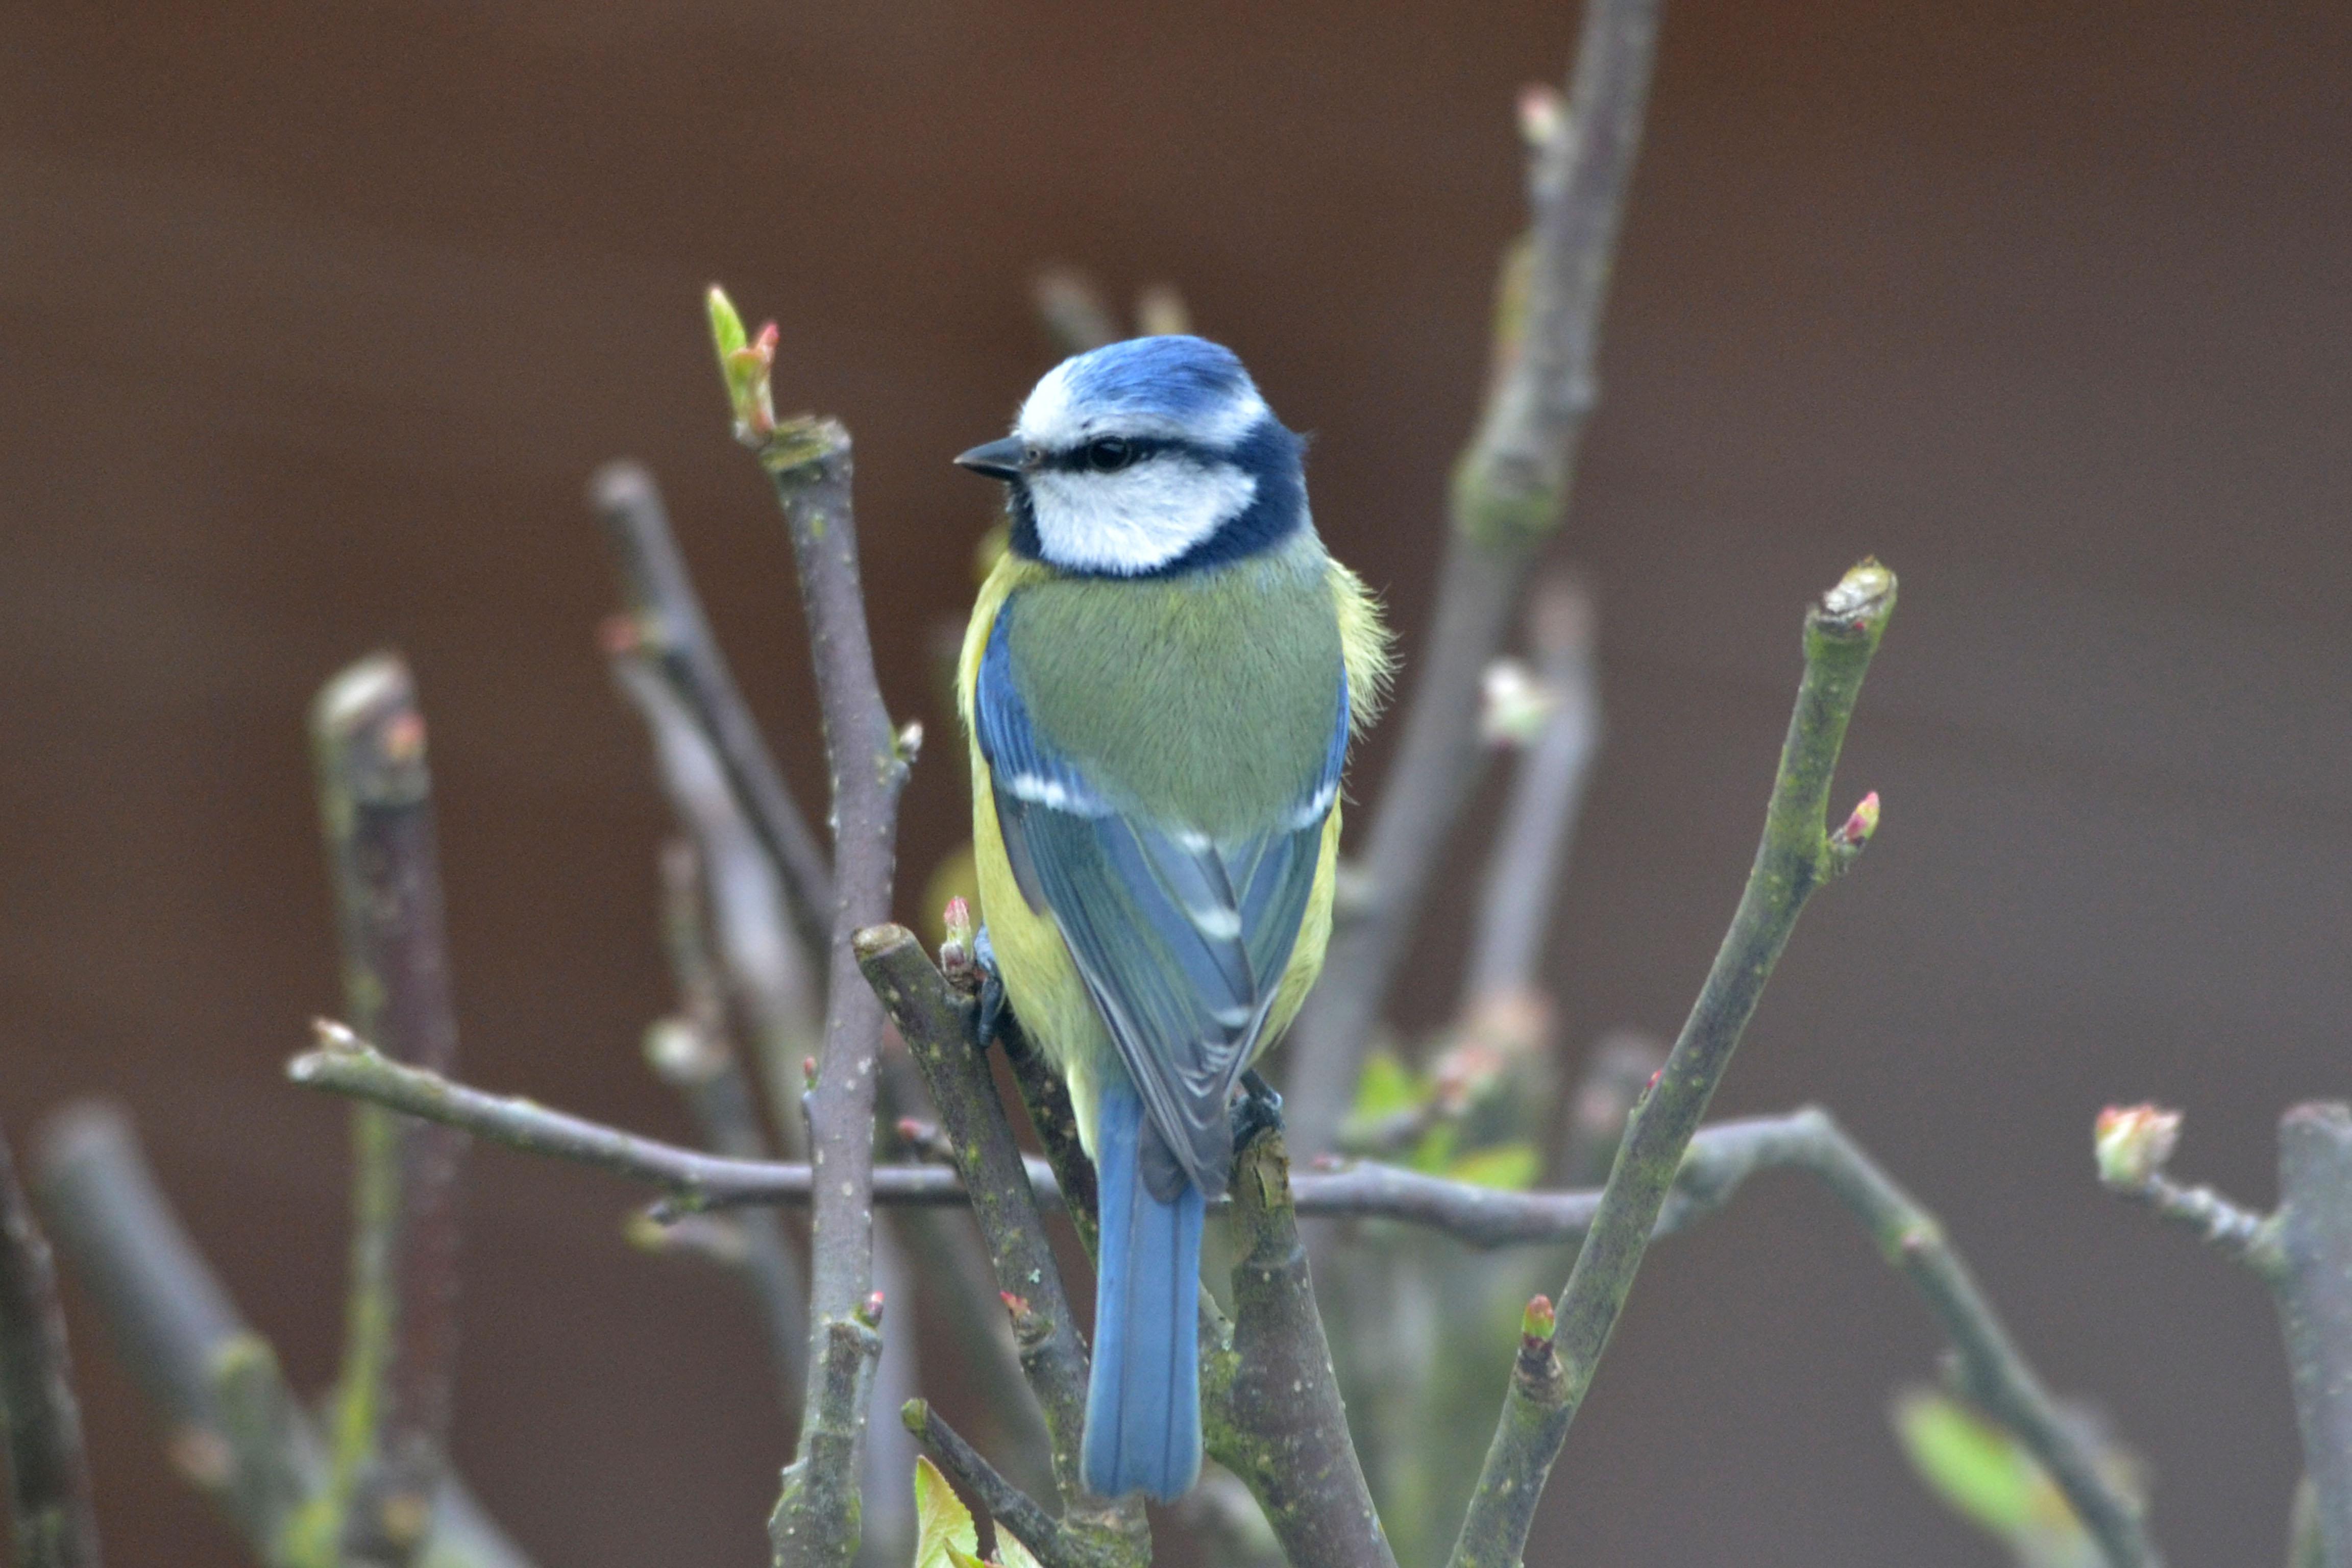 A blue tit on jasmine in the spring Photo: Denise Pallett